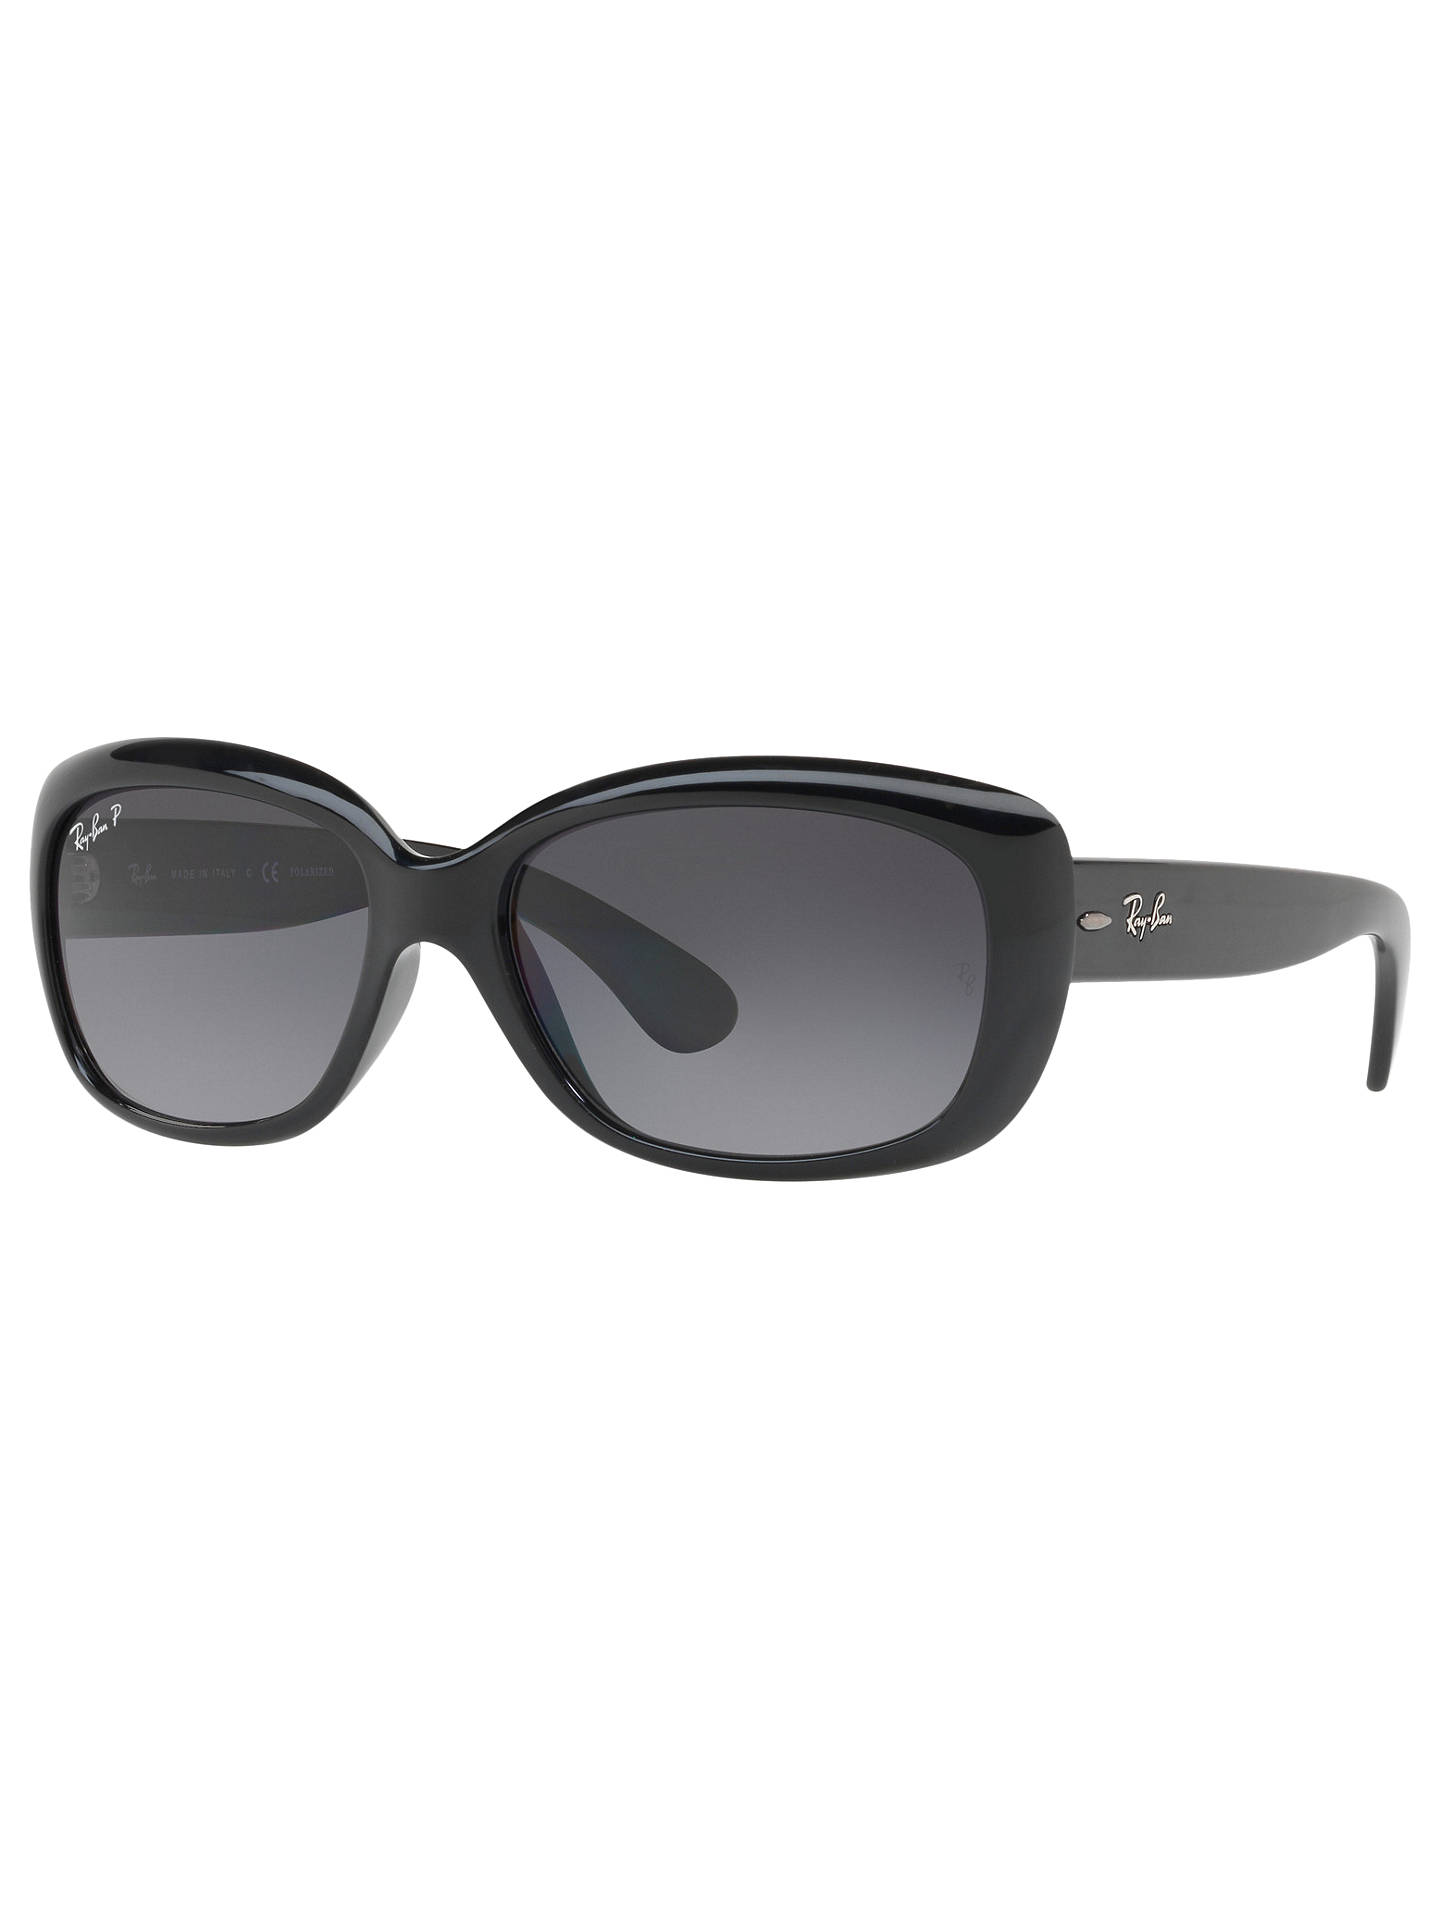 5c85a1e276a Ray-Ban RB4101 Polarised Jackie Ohh Rectangular Sunglasses at John ...